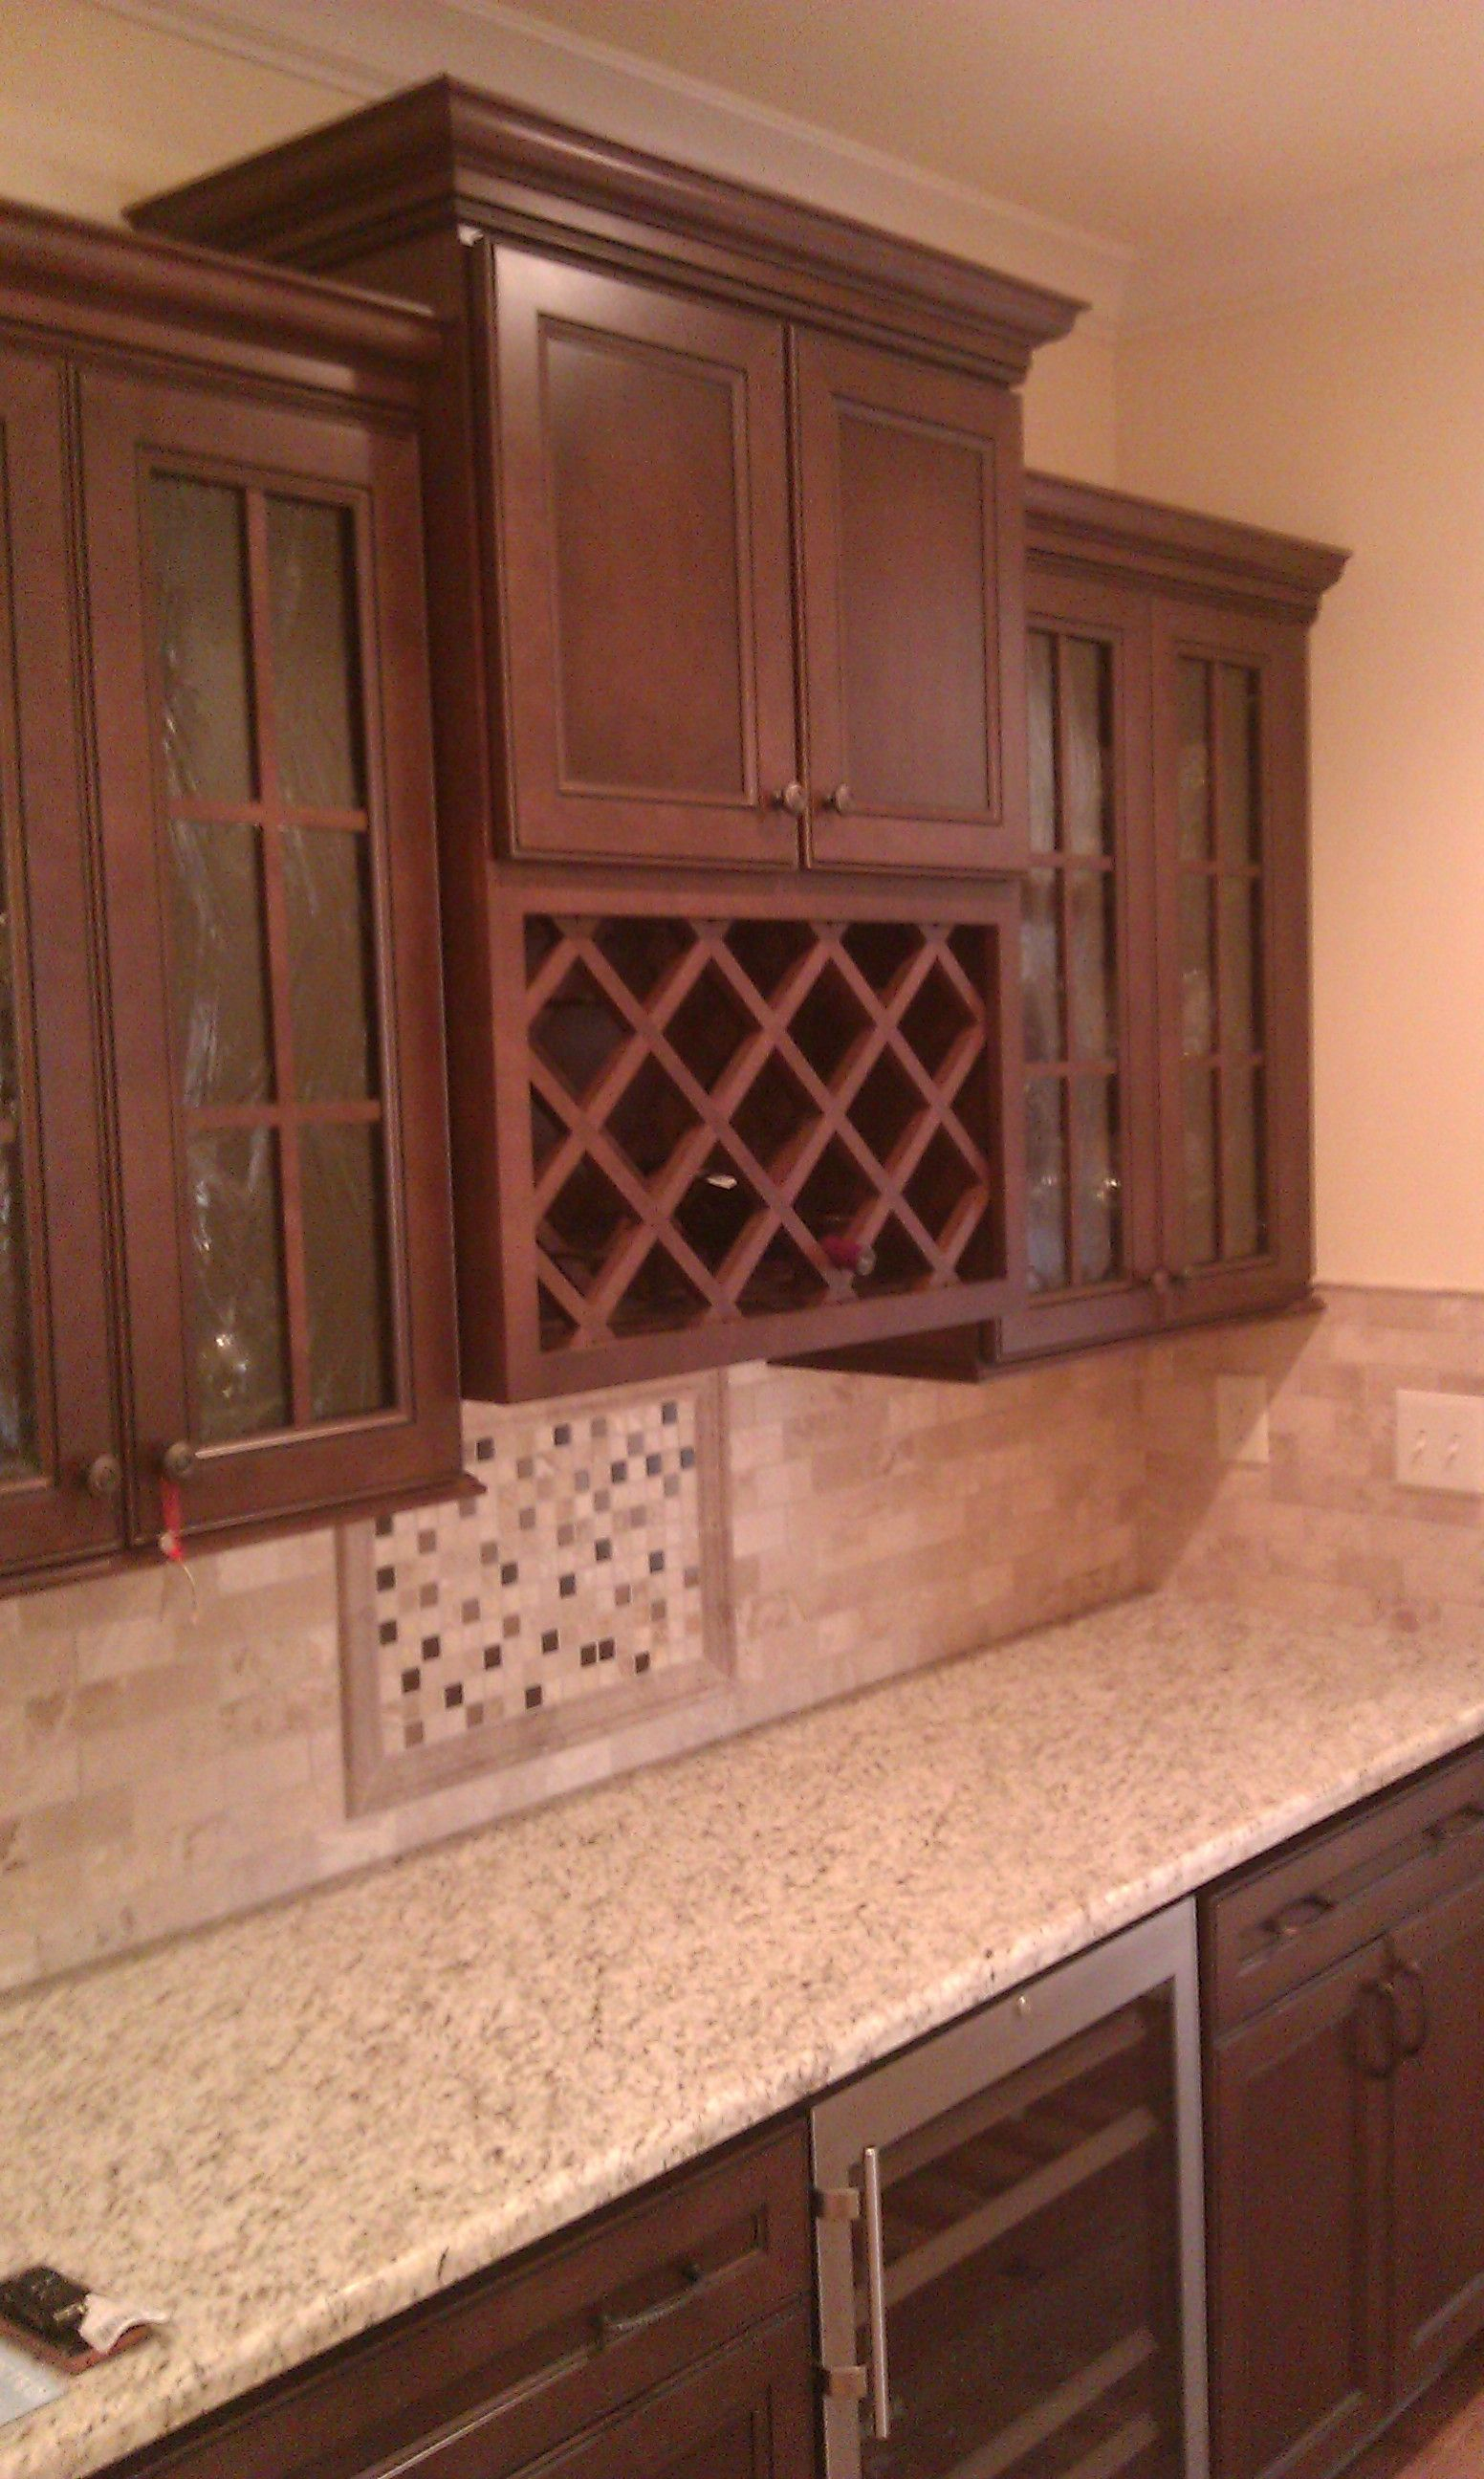 Kitchen cabinet doors tulsa ok - Bar Cabinet Winerack Homecrest Cabinetry Eastport Maple Bison With Ebony Glaze